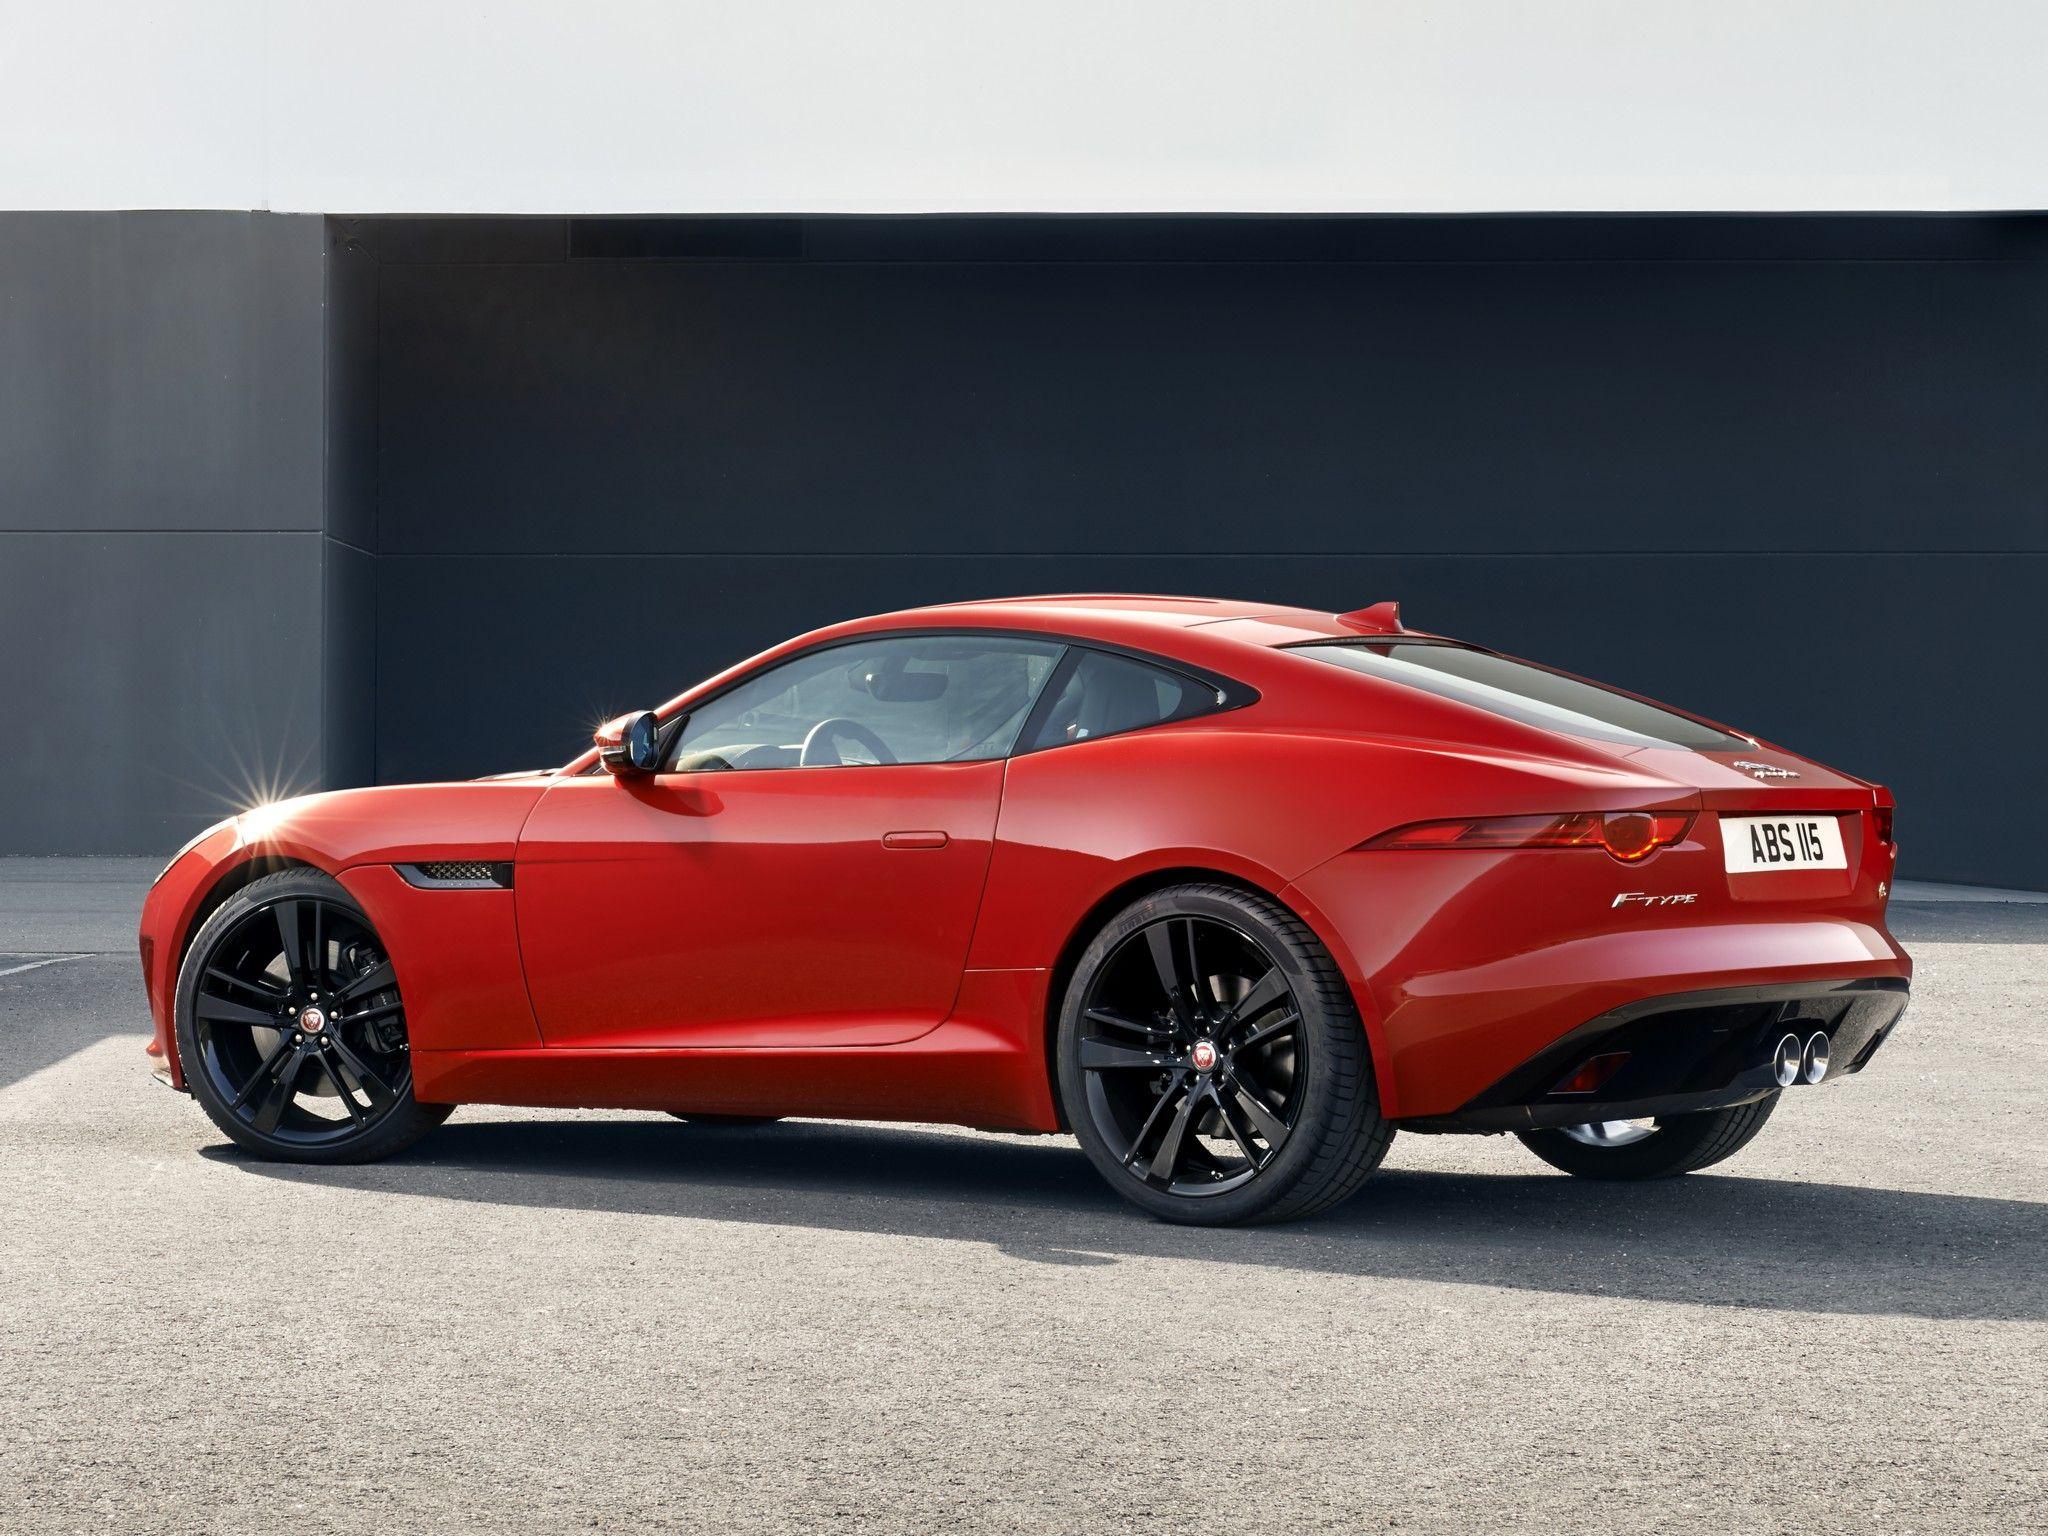 2014 Jaguar F Type S Coupé Jaguar F Type Jaguar Jaguar Car